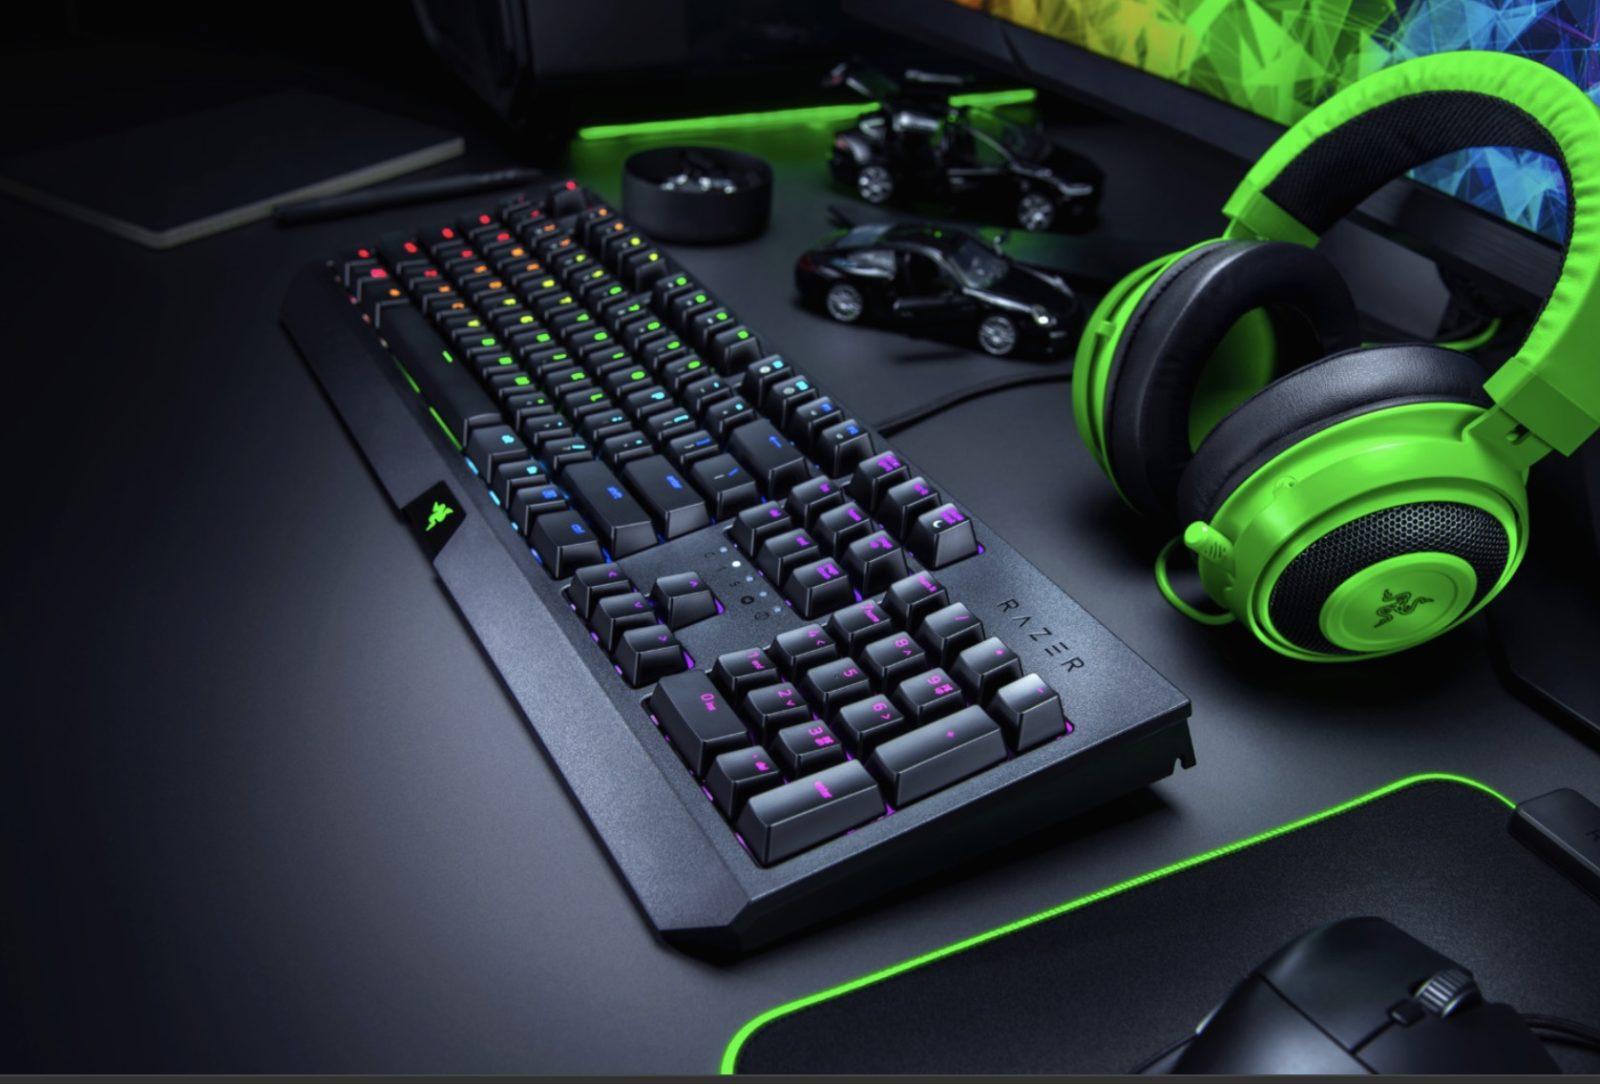 Razer BlackWidow, Kraken, Basilisk Essential tre periferiche gaming di qualità a costi accessibili